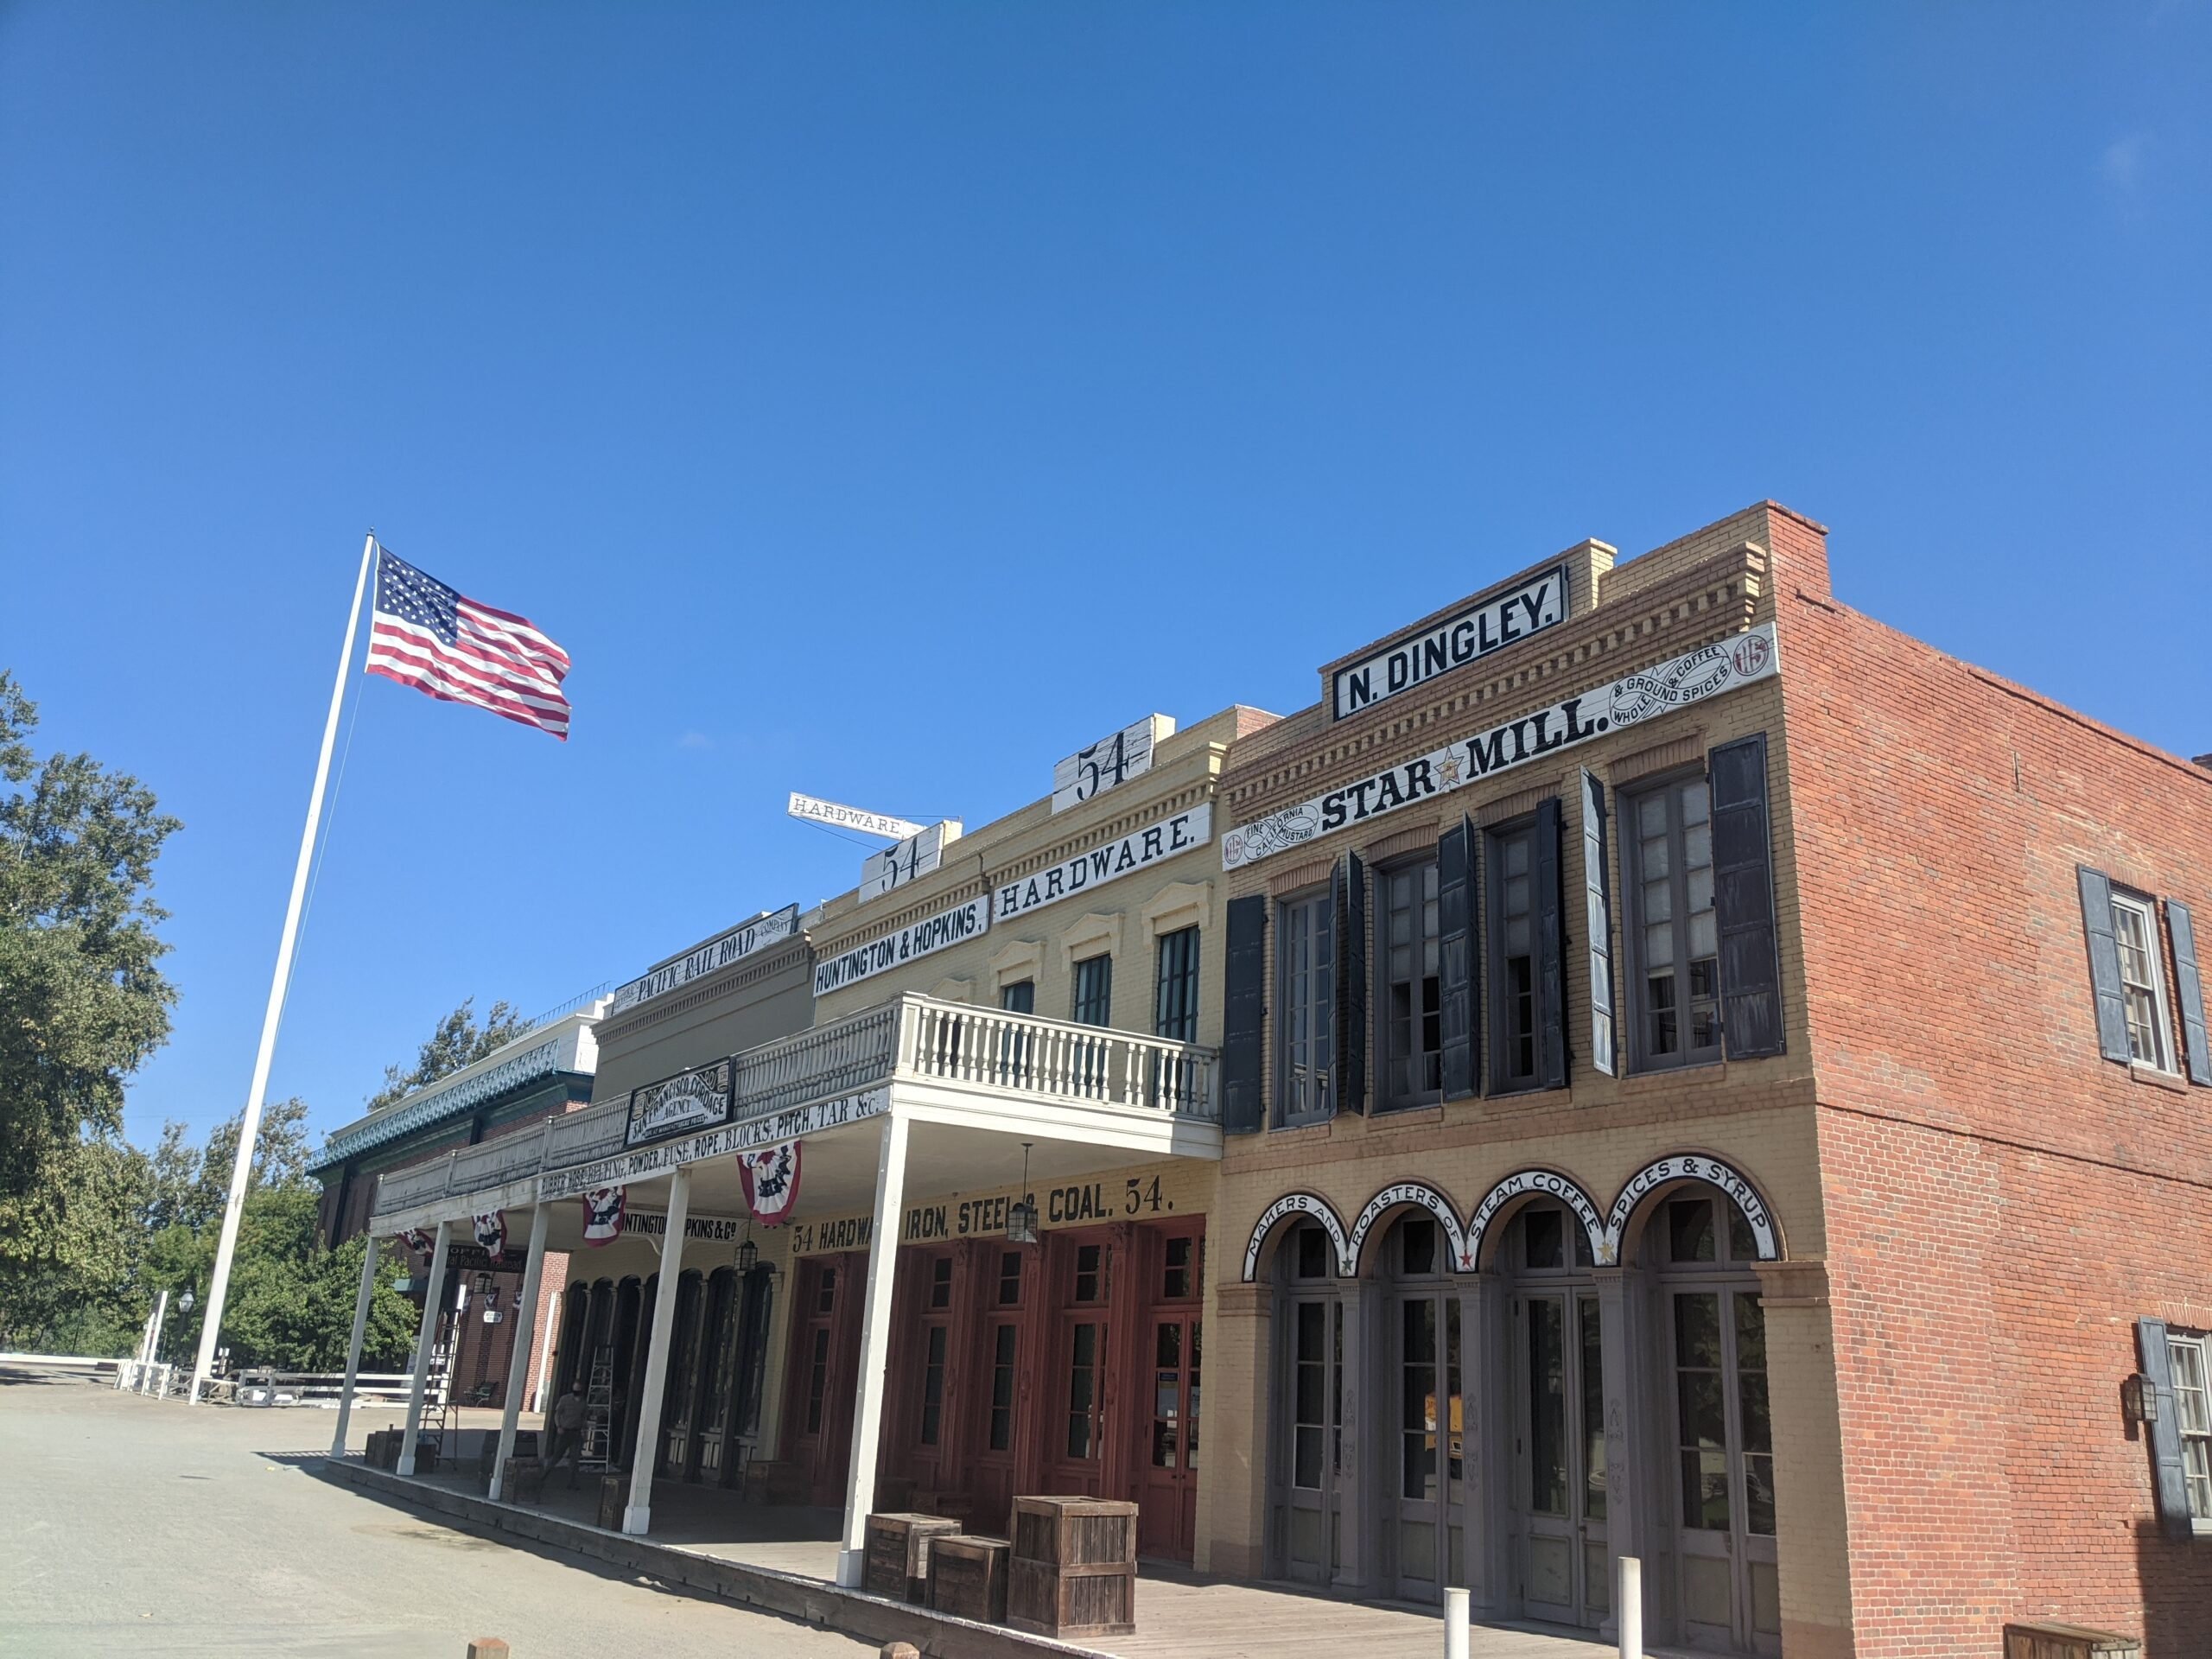 Old Sacramento Star Mill